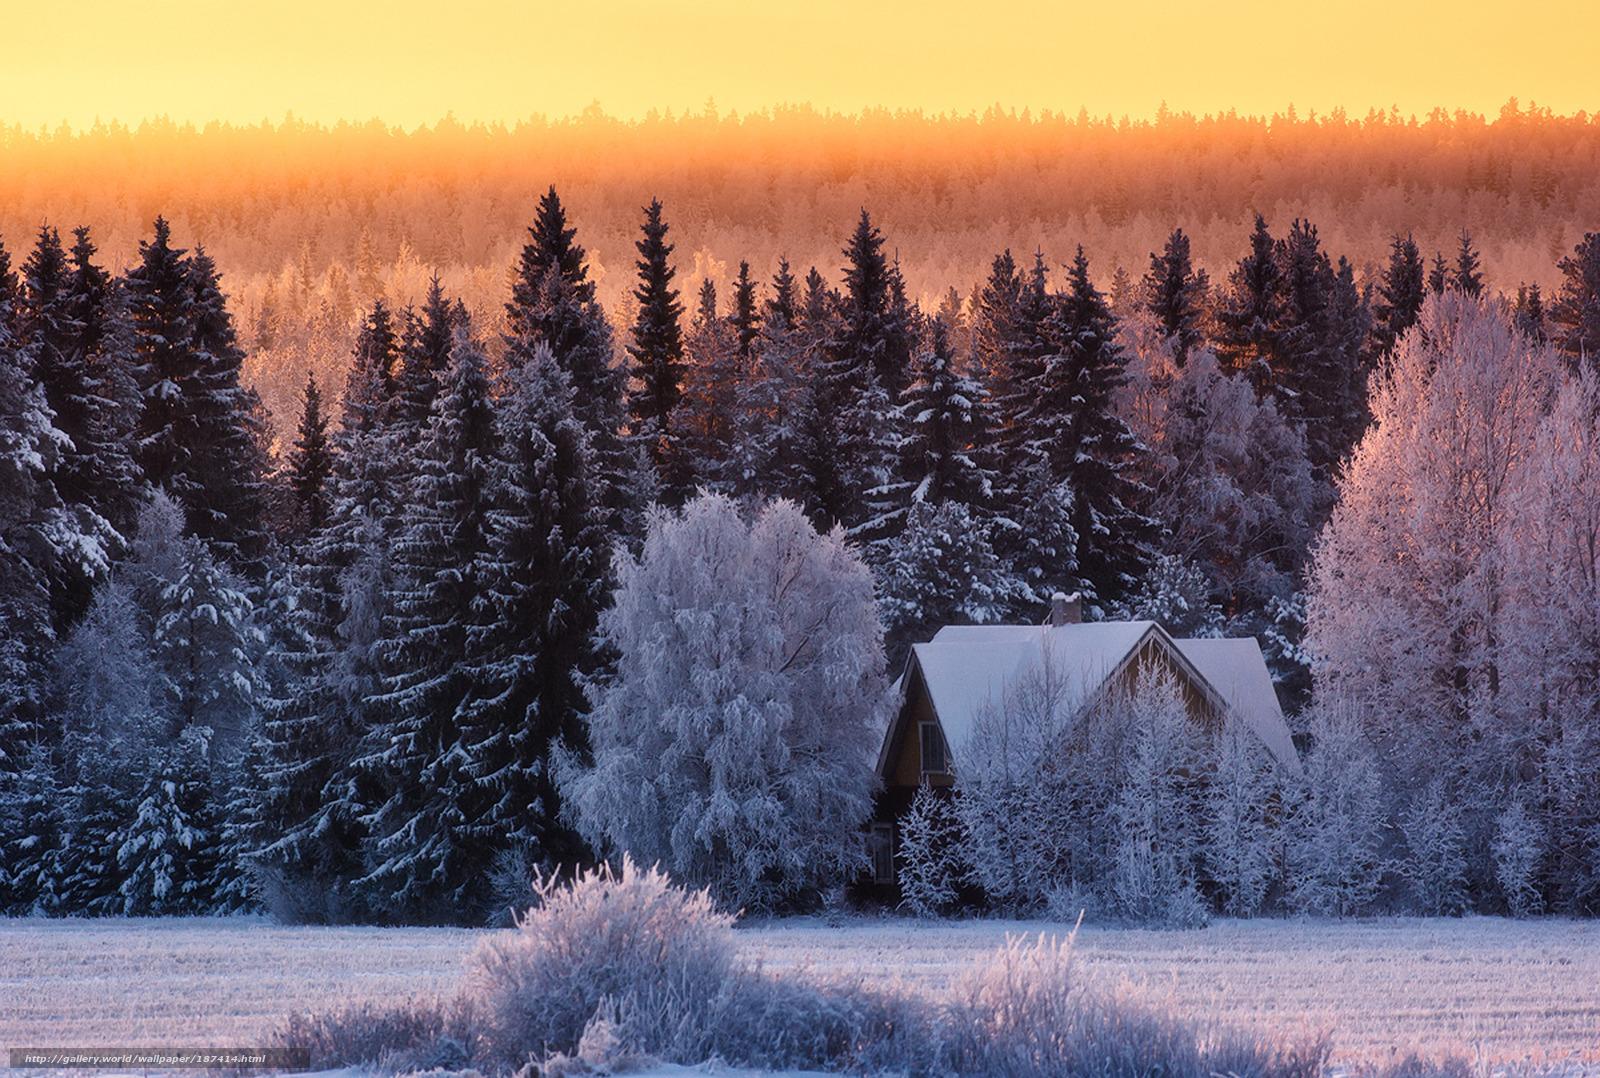 Scaricare gli sfondi inverno gelo foresta neve sfondi for Desktop gratis inverno